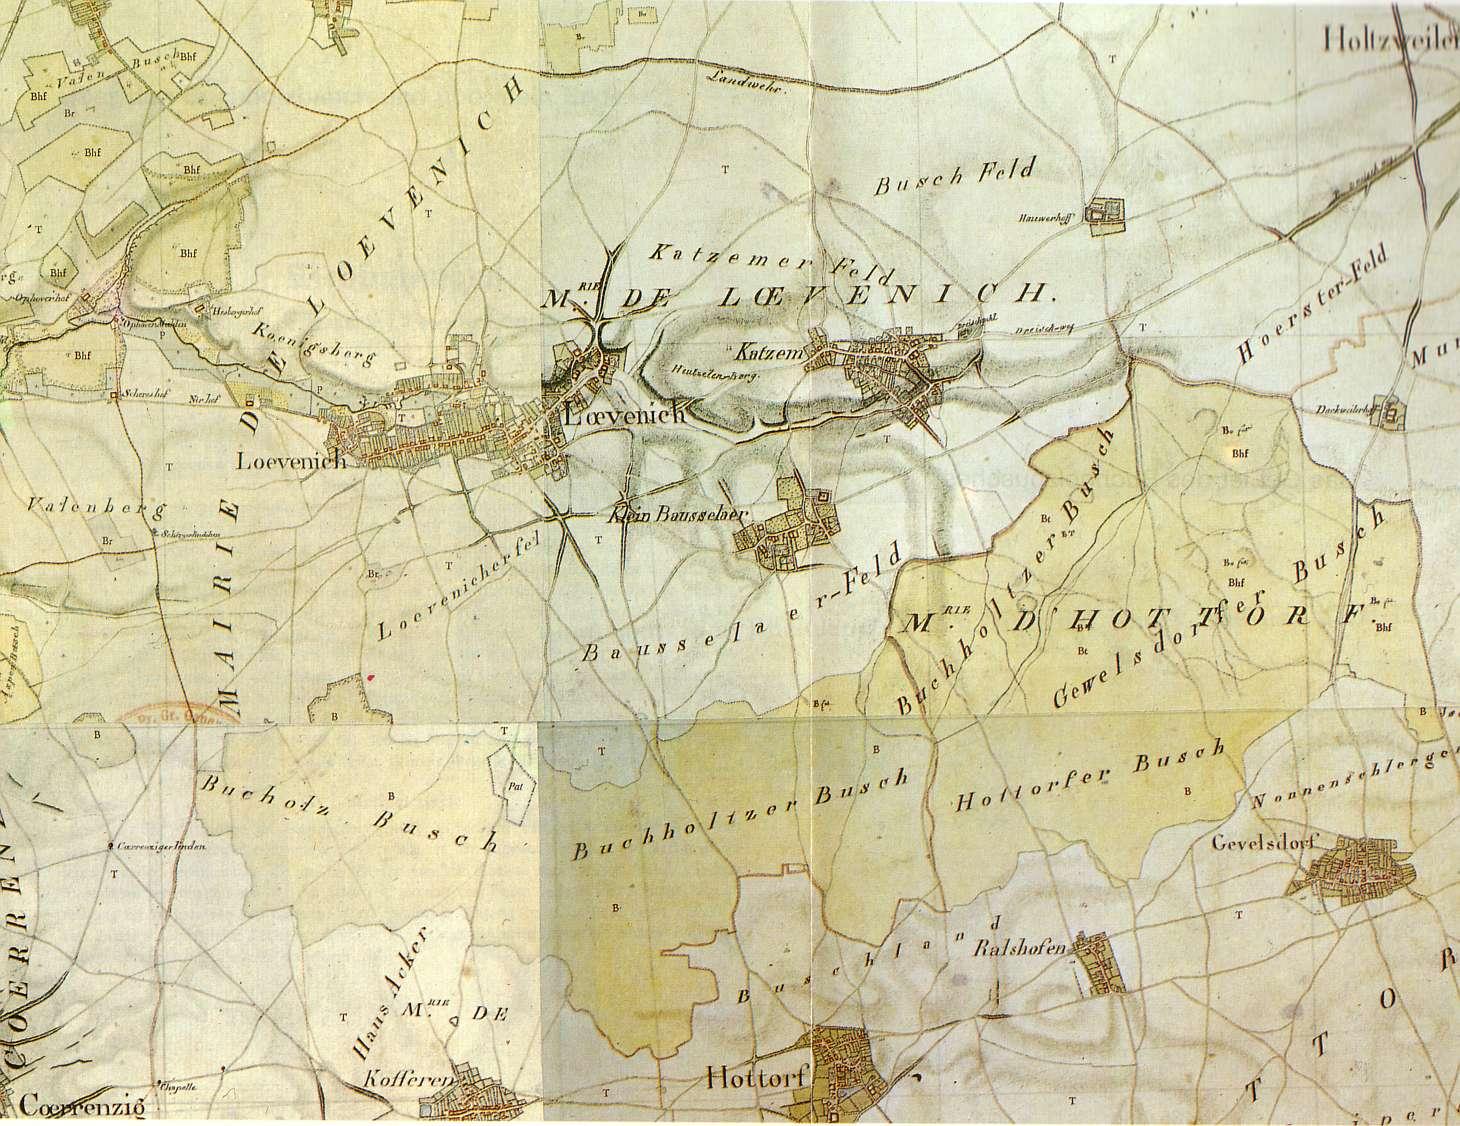 Karte_Marie_Loevenich Map Of Erkelenz Germany on map of remagen germany, map of neuss germany, map of bonn germany, map of siegen germany, map of germersheim germany, map of wetzlar germany, map of ansbach germany, map of geilenkirchen germany, map of alzenau germany, map of greiz germany, map of kusel germany, map of dorsten germany, map of xanten germany, map of sindelfingen germany, map of eisleben germany, map of paderborn germany, map of olpe germany, map of haltern germany, map of hamm germany, map of essen germany,